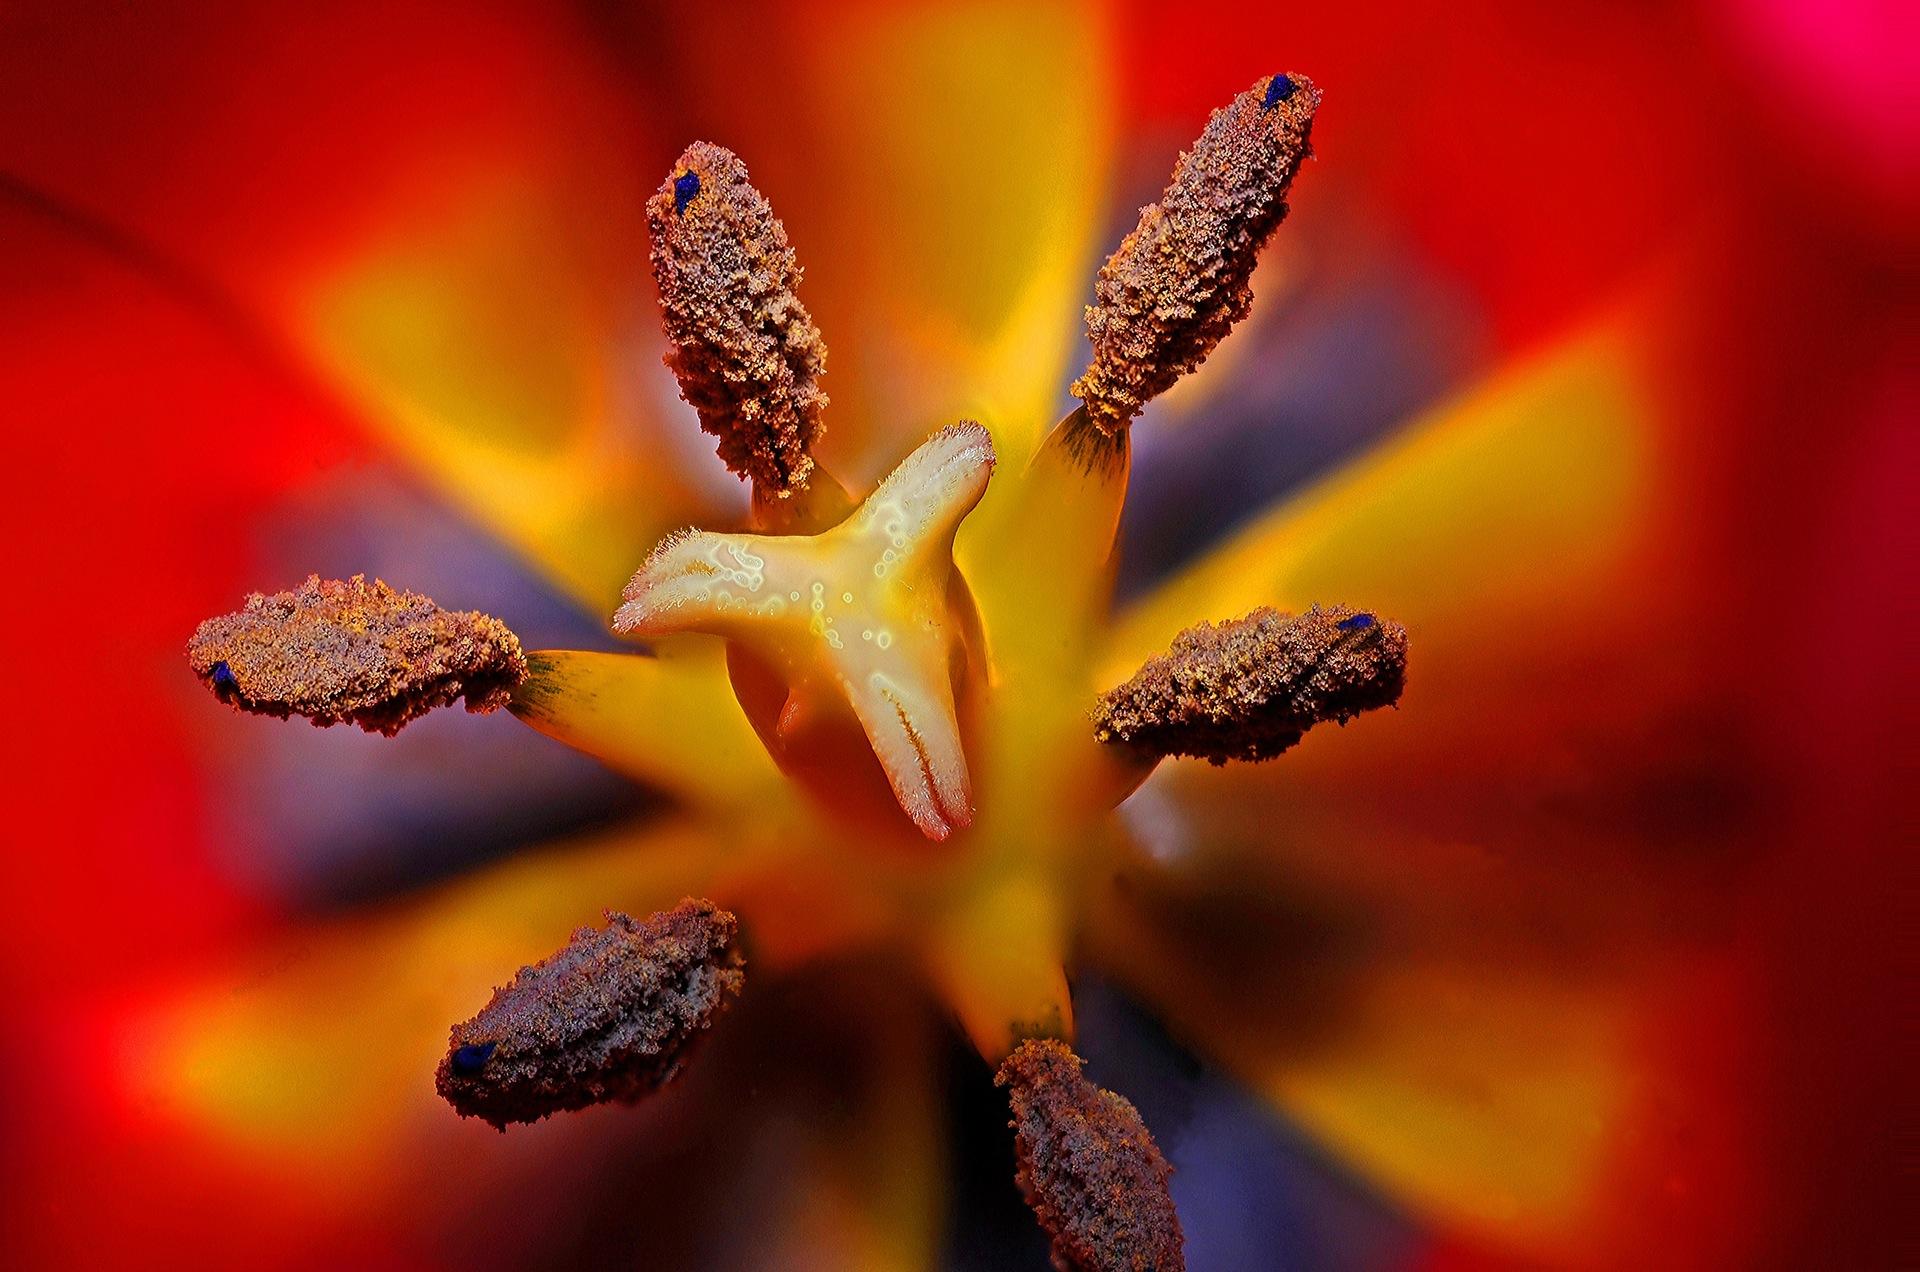 Blume, Bloom, Staubfäden, Bestäubung, Rot - Wallpaper HD - Prof.-falken.com